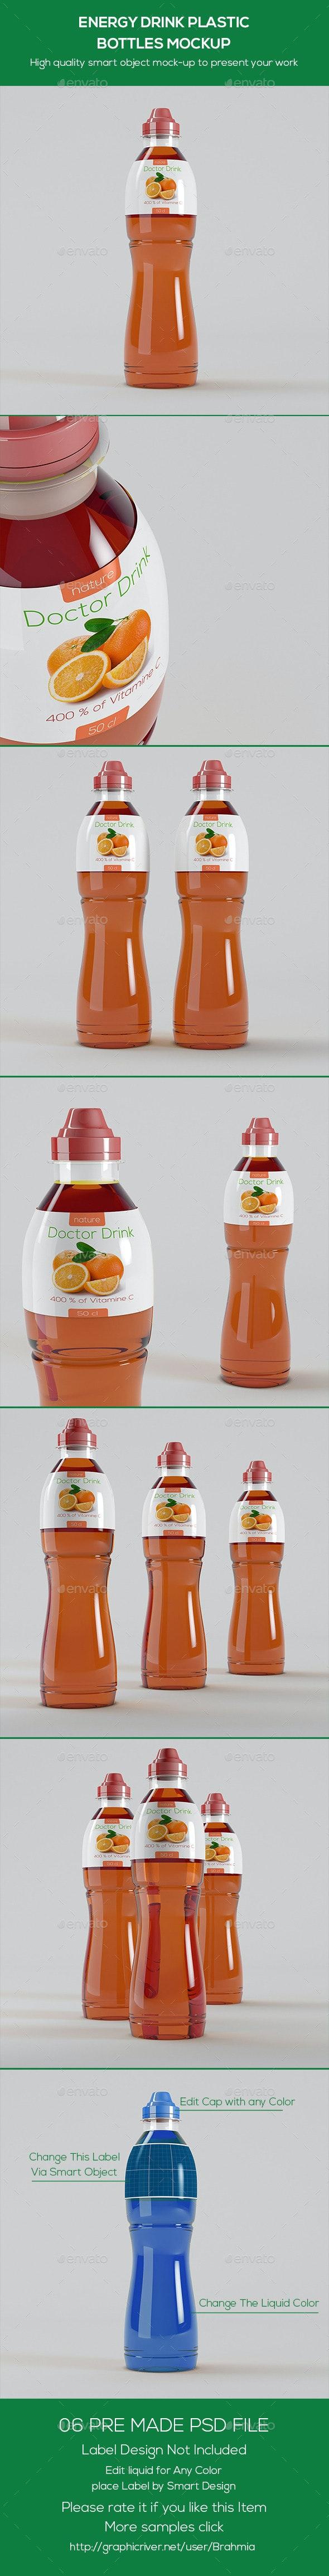 Energy Drink Plastic Bottles Mockup - Miscellaneous Packaging